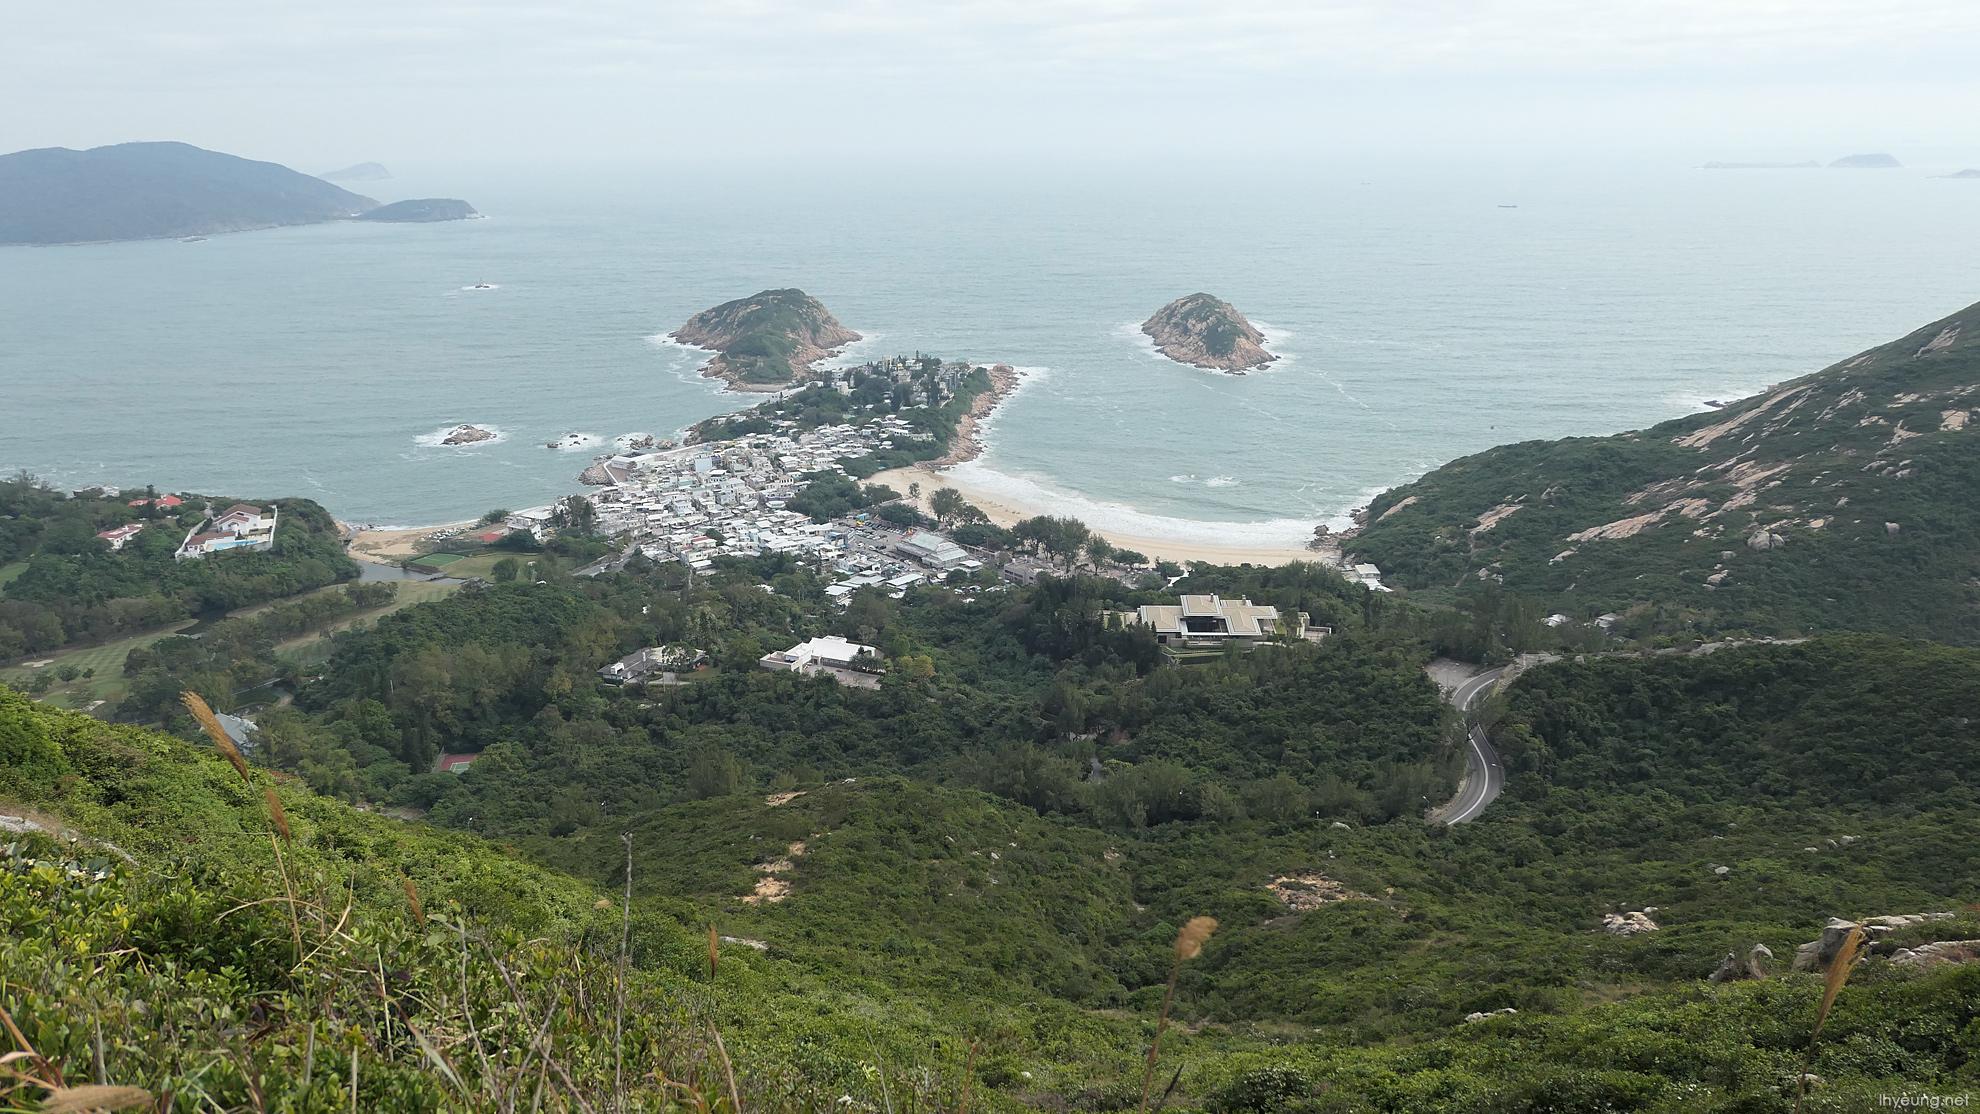 Hiking In Hong Kong Trail Section 8 Dragons Back Lh Yeungnet - Hong-kong-villa-located-in-shek-o